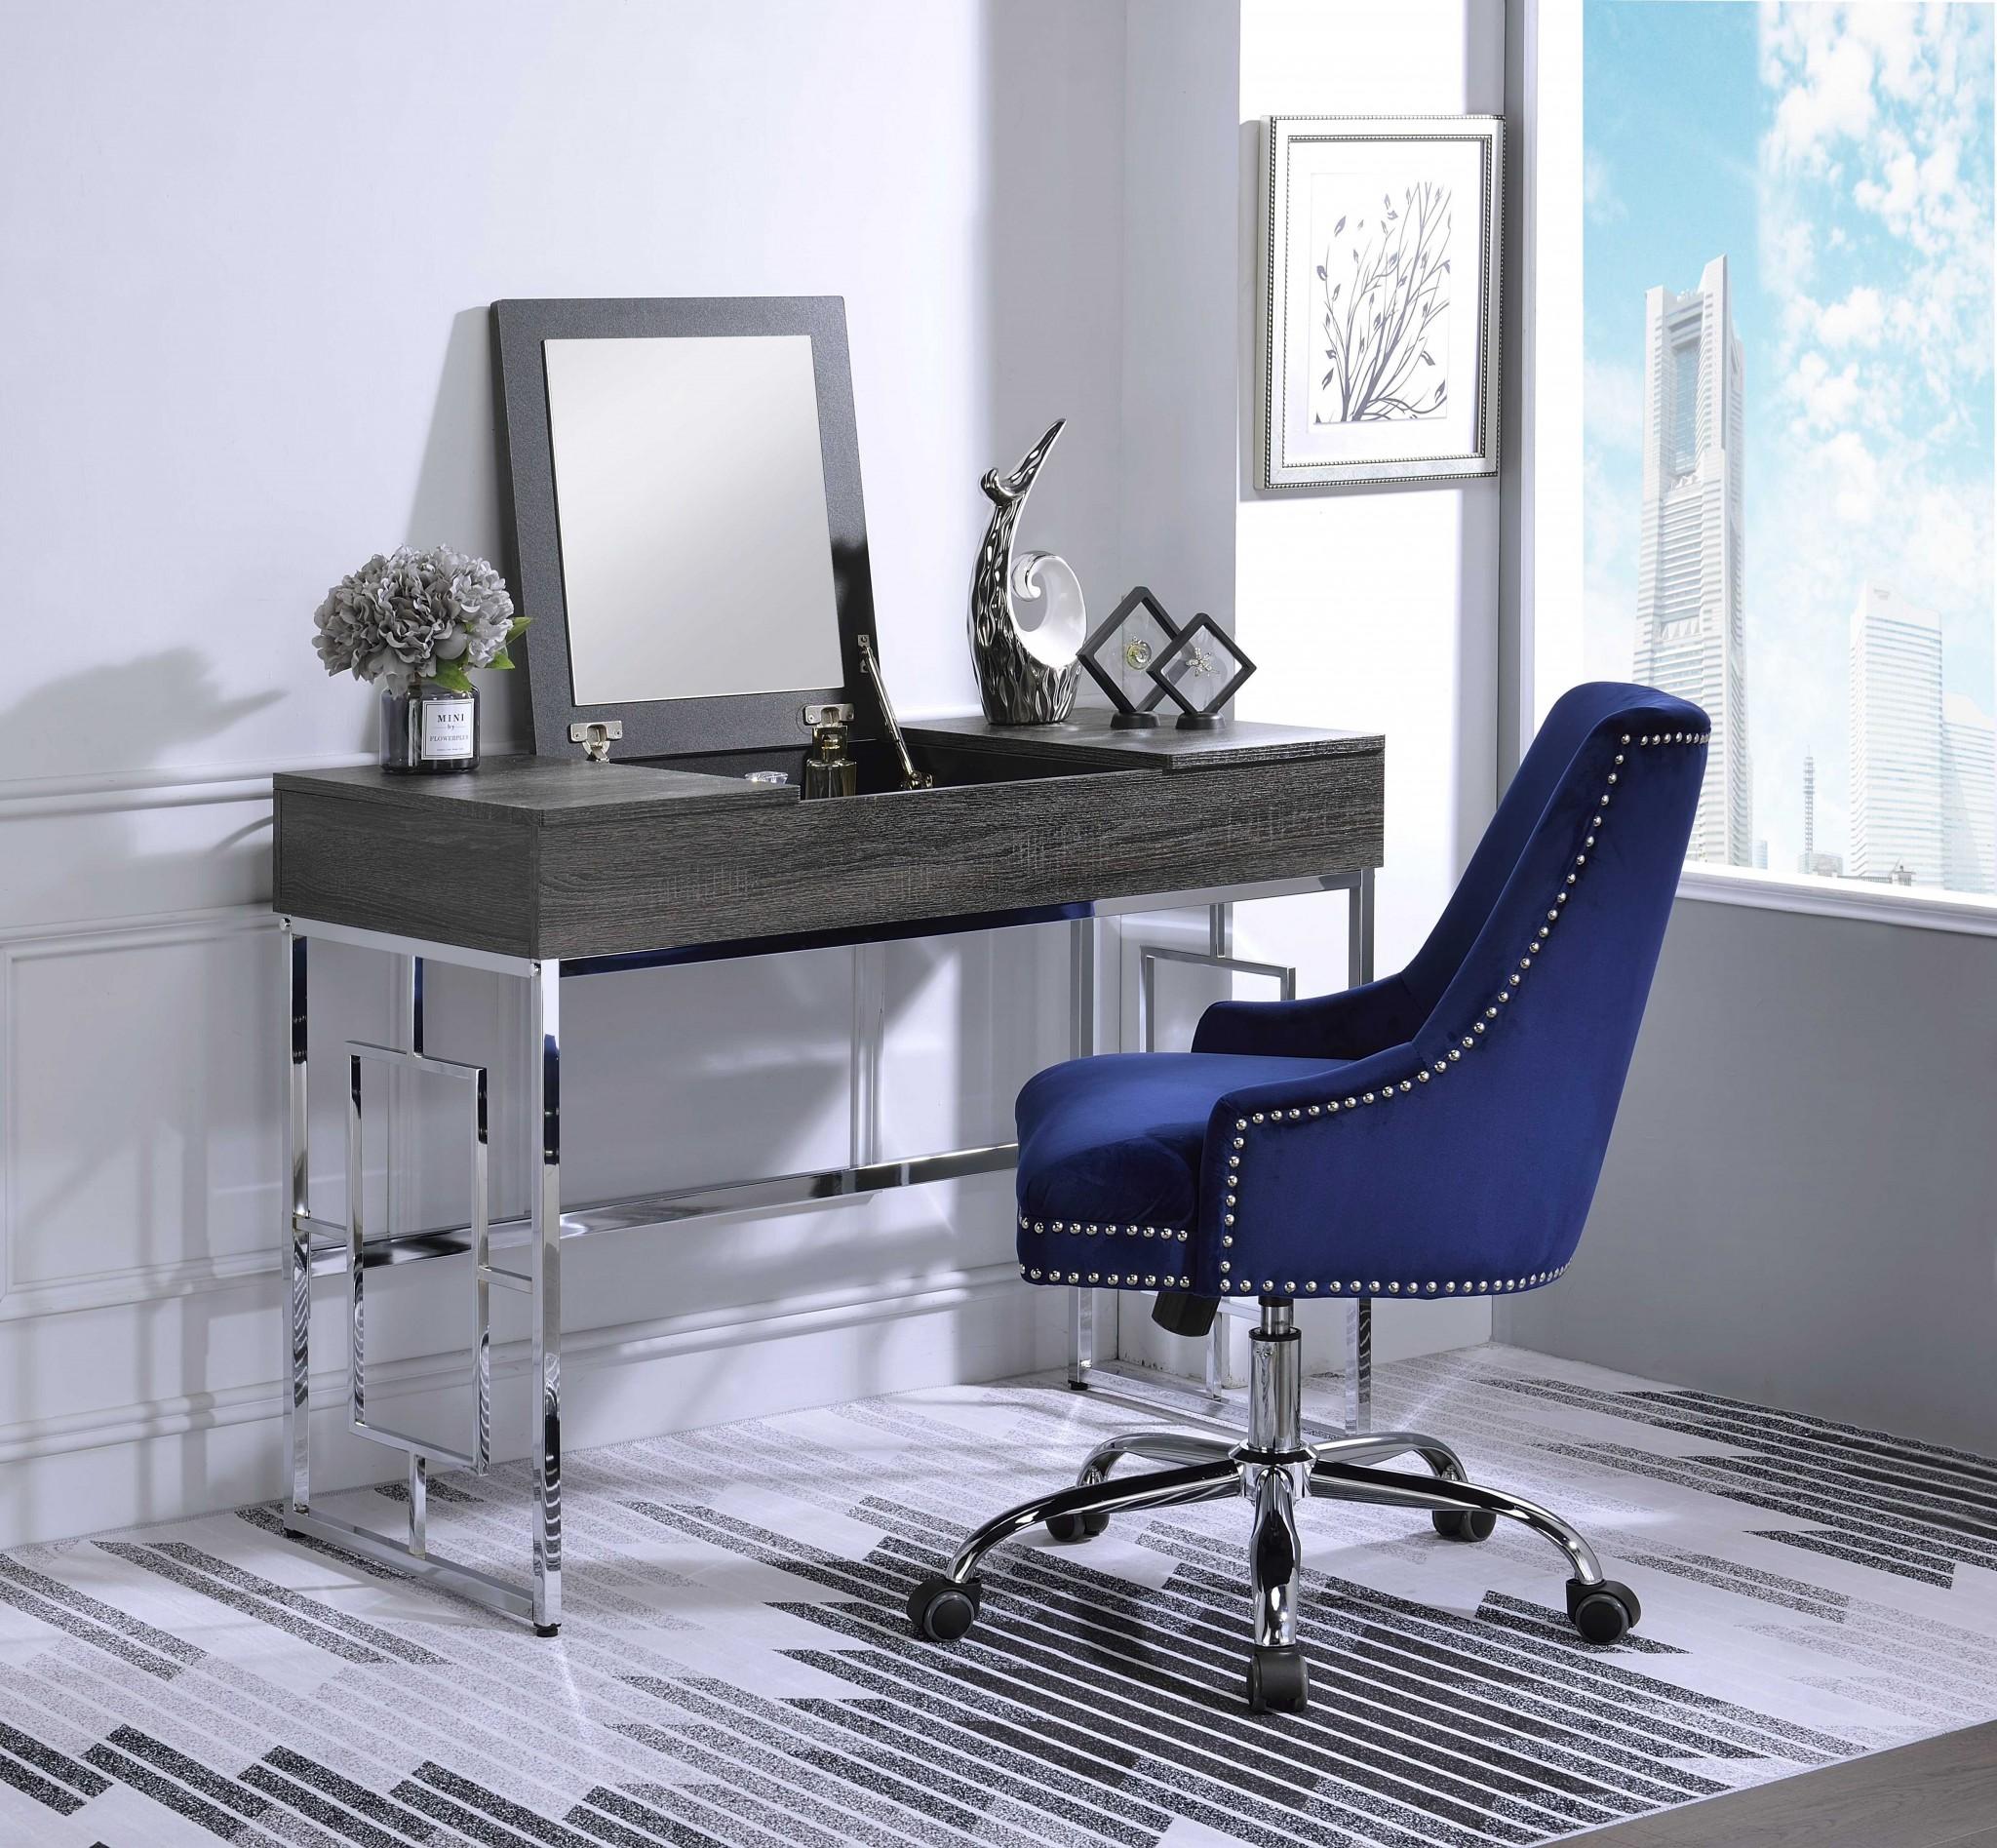 "44"" X 20"" X 32"" Chrome And Black Metal Tube Vanity Desk"